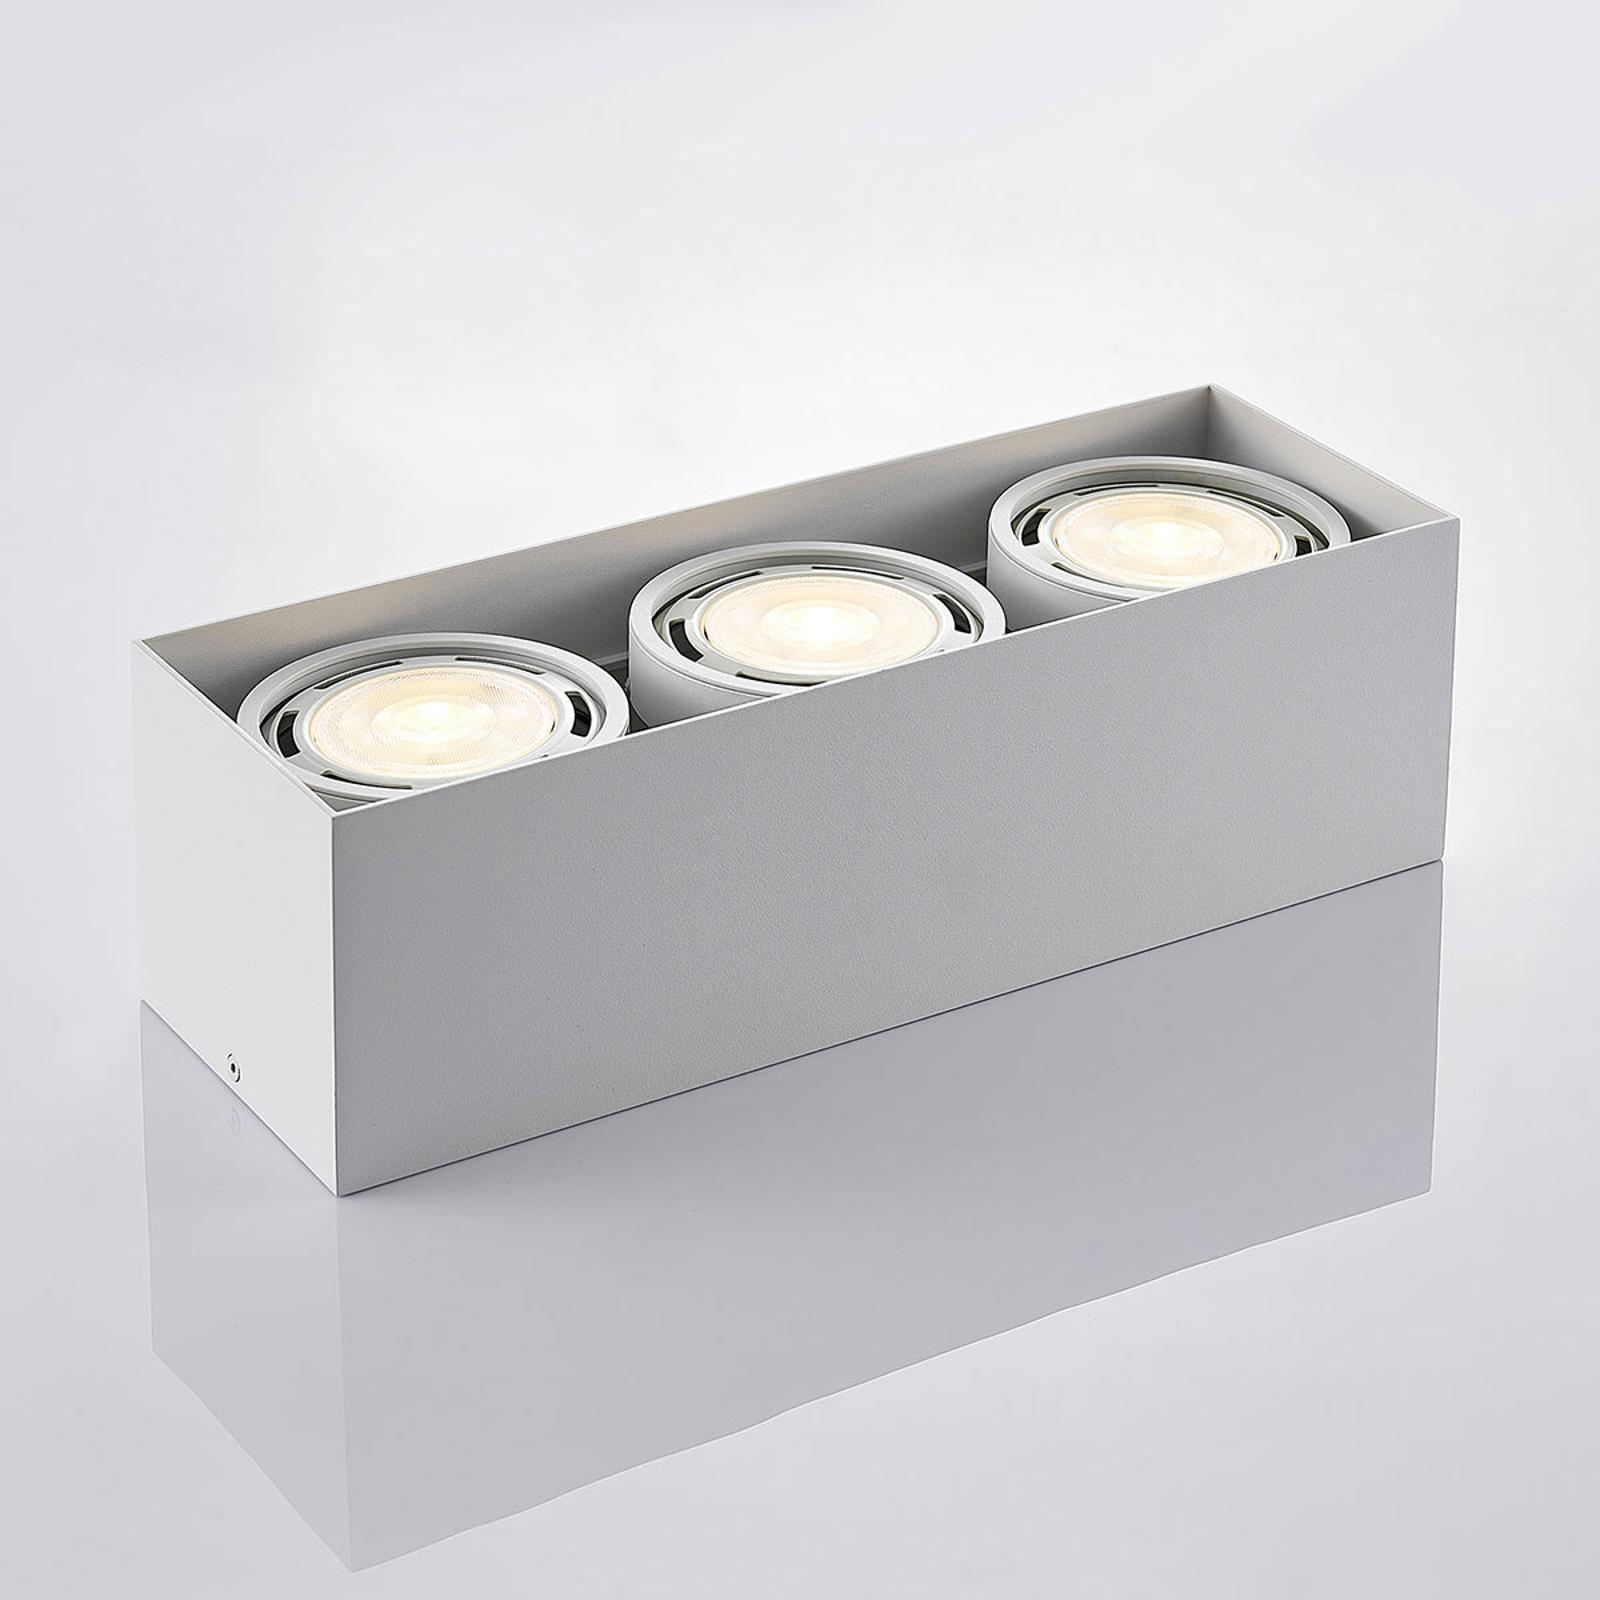 LED downlight Rosalie 1 lampa kantig vit | Lamp24.se